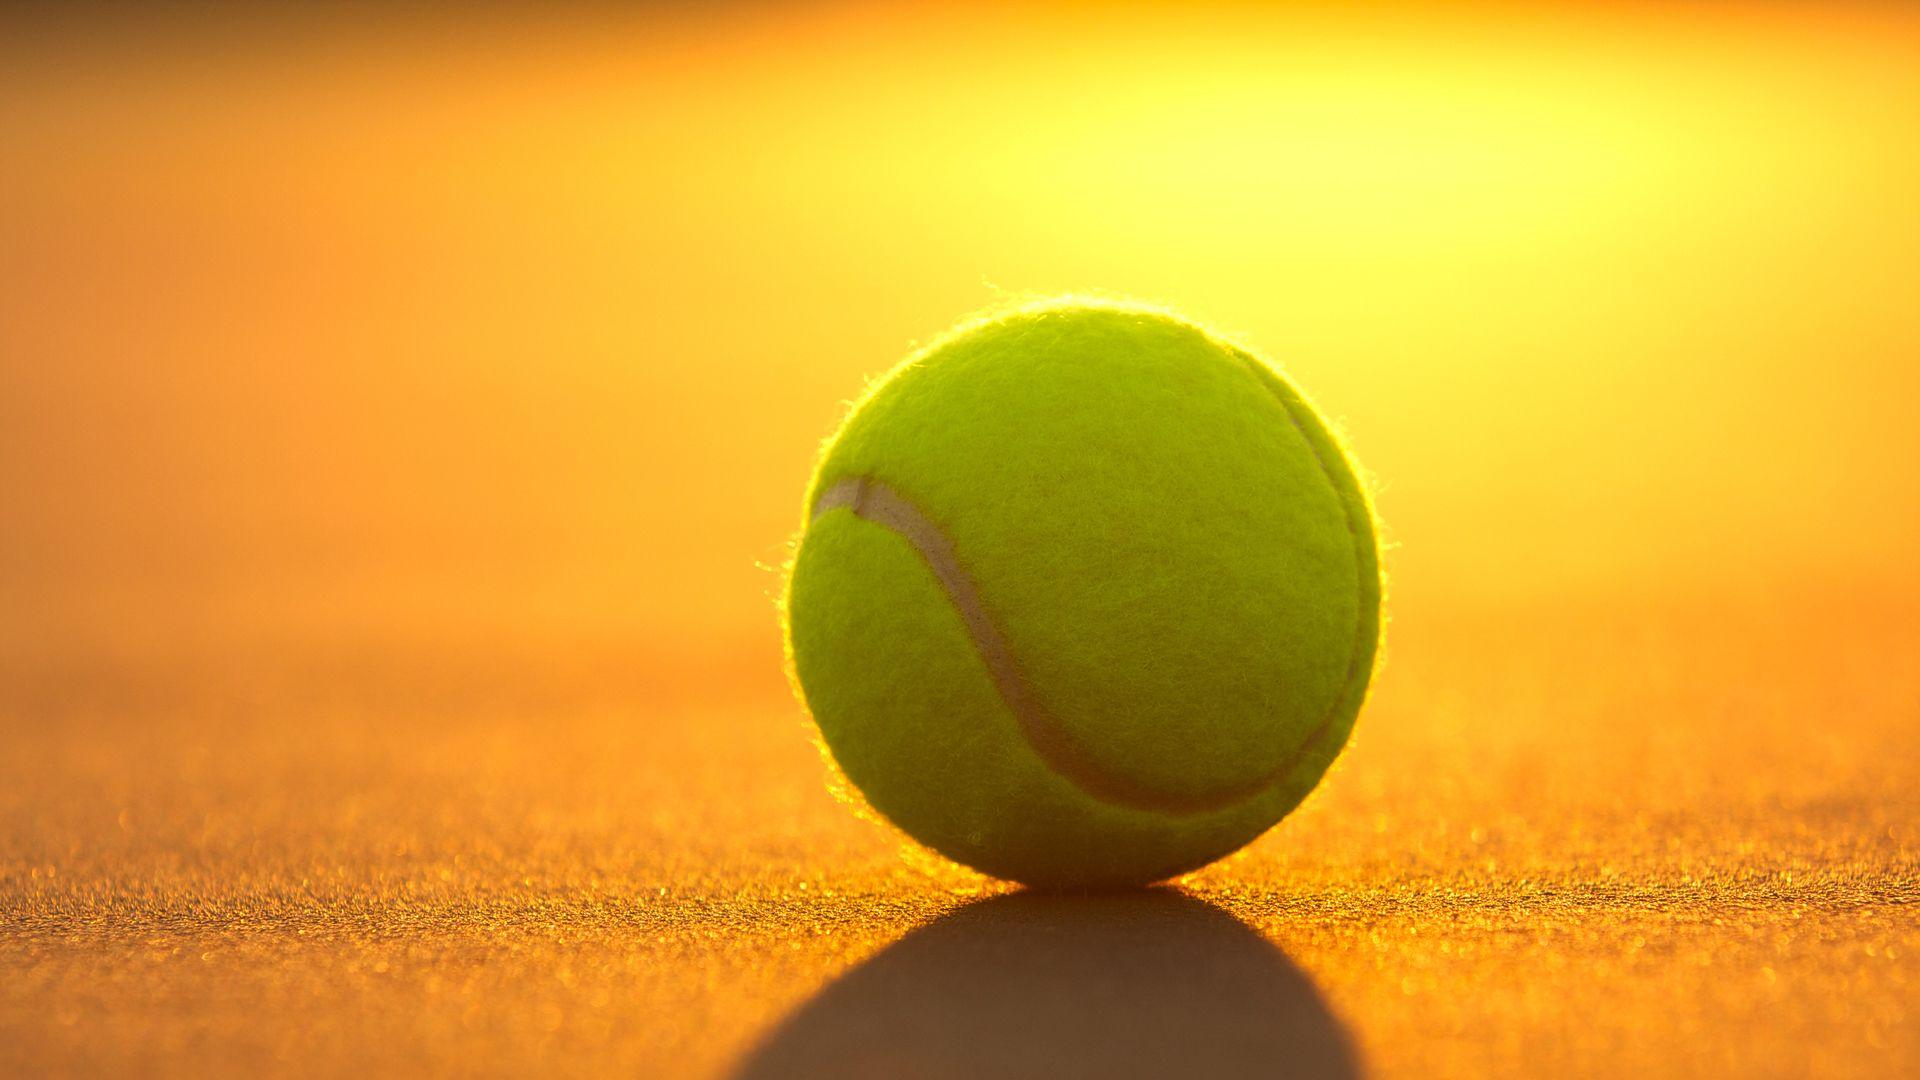 7 Rising Stars Of Men S Tennis In 2020 Tennis Wallpaper Tennis Photos Tennis